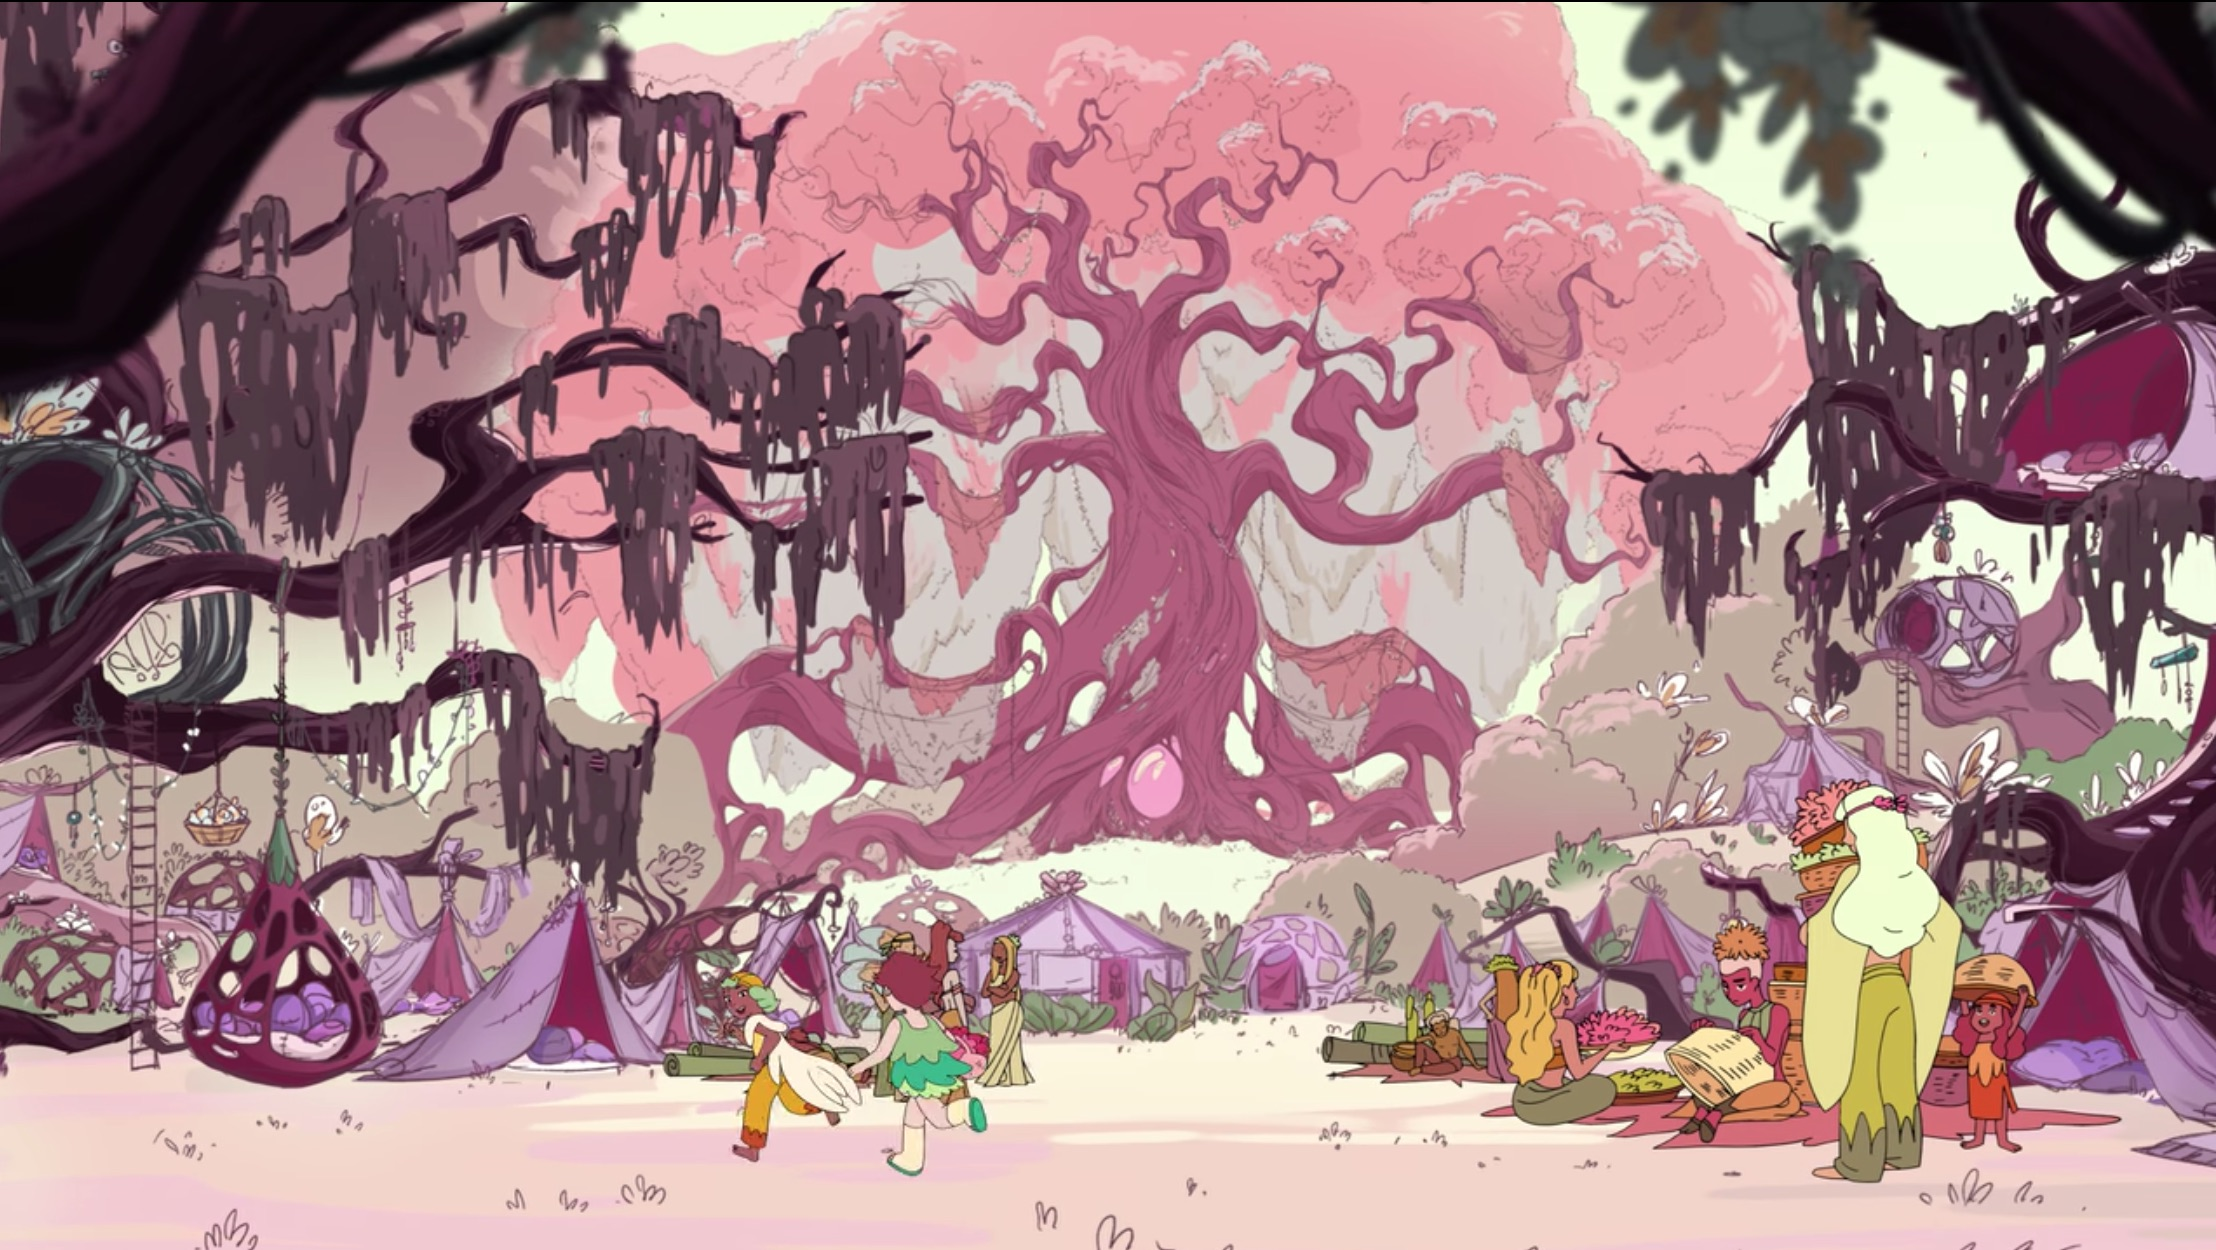 Plumeria (She-Ra and the Princesses of Power)